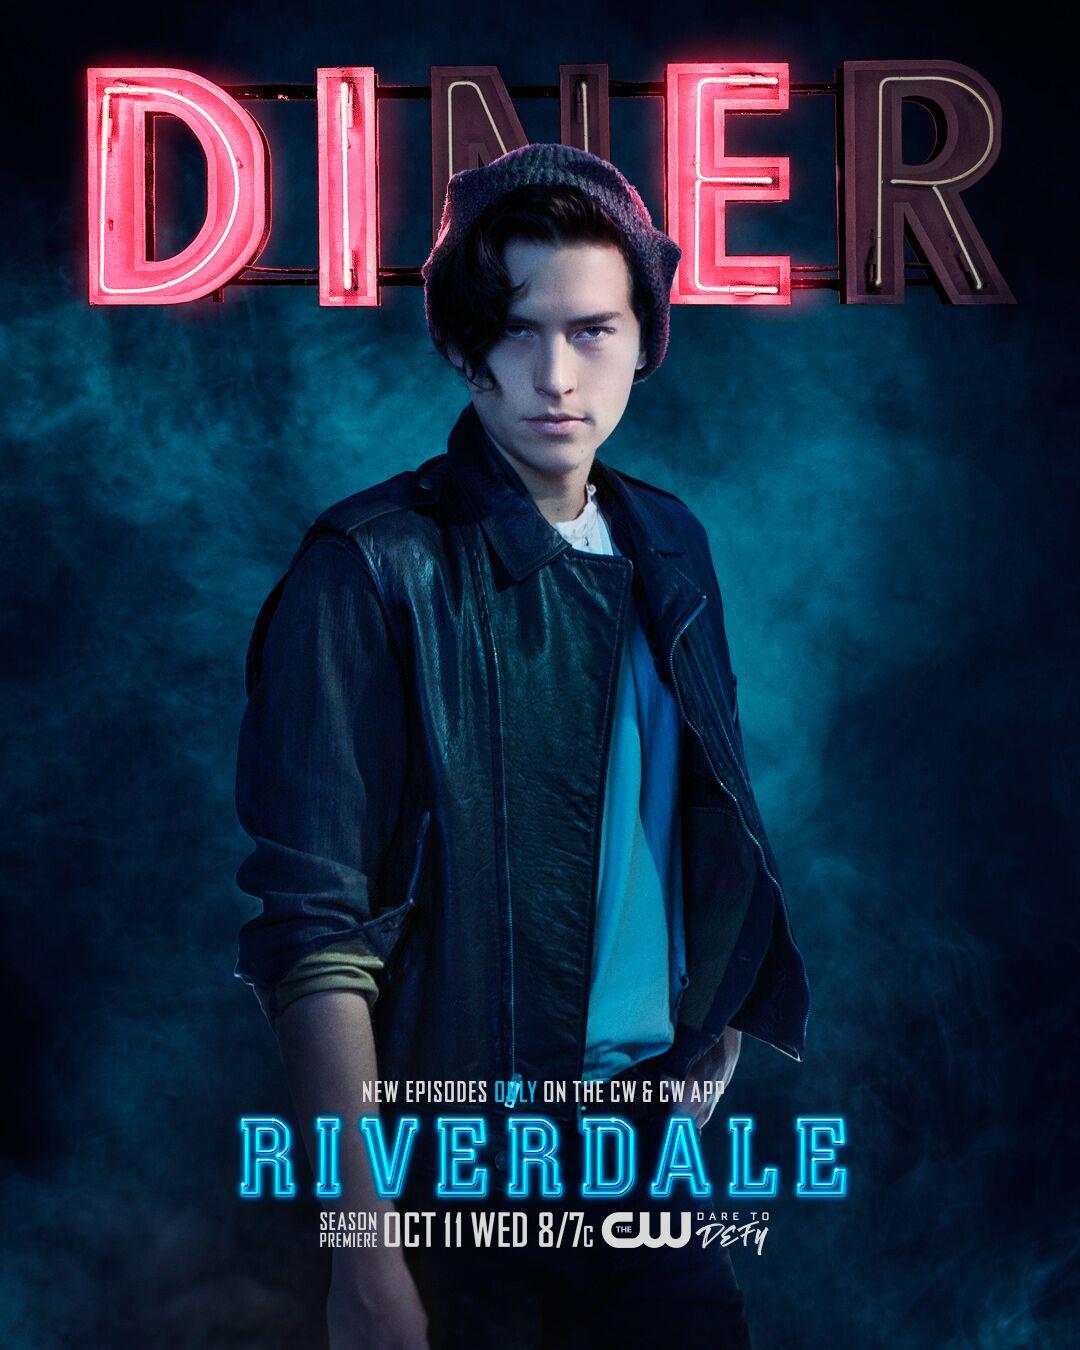 I'm a vampire now.  Tonight, 8pm, CW. Season 2 premiere. #riverdale https://t.co/XvXkGjxr6k